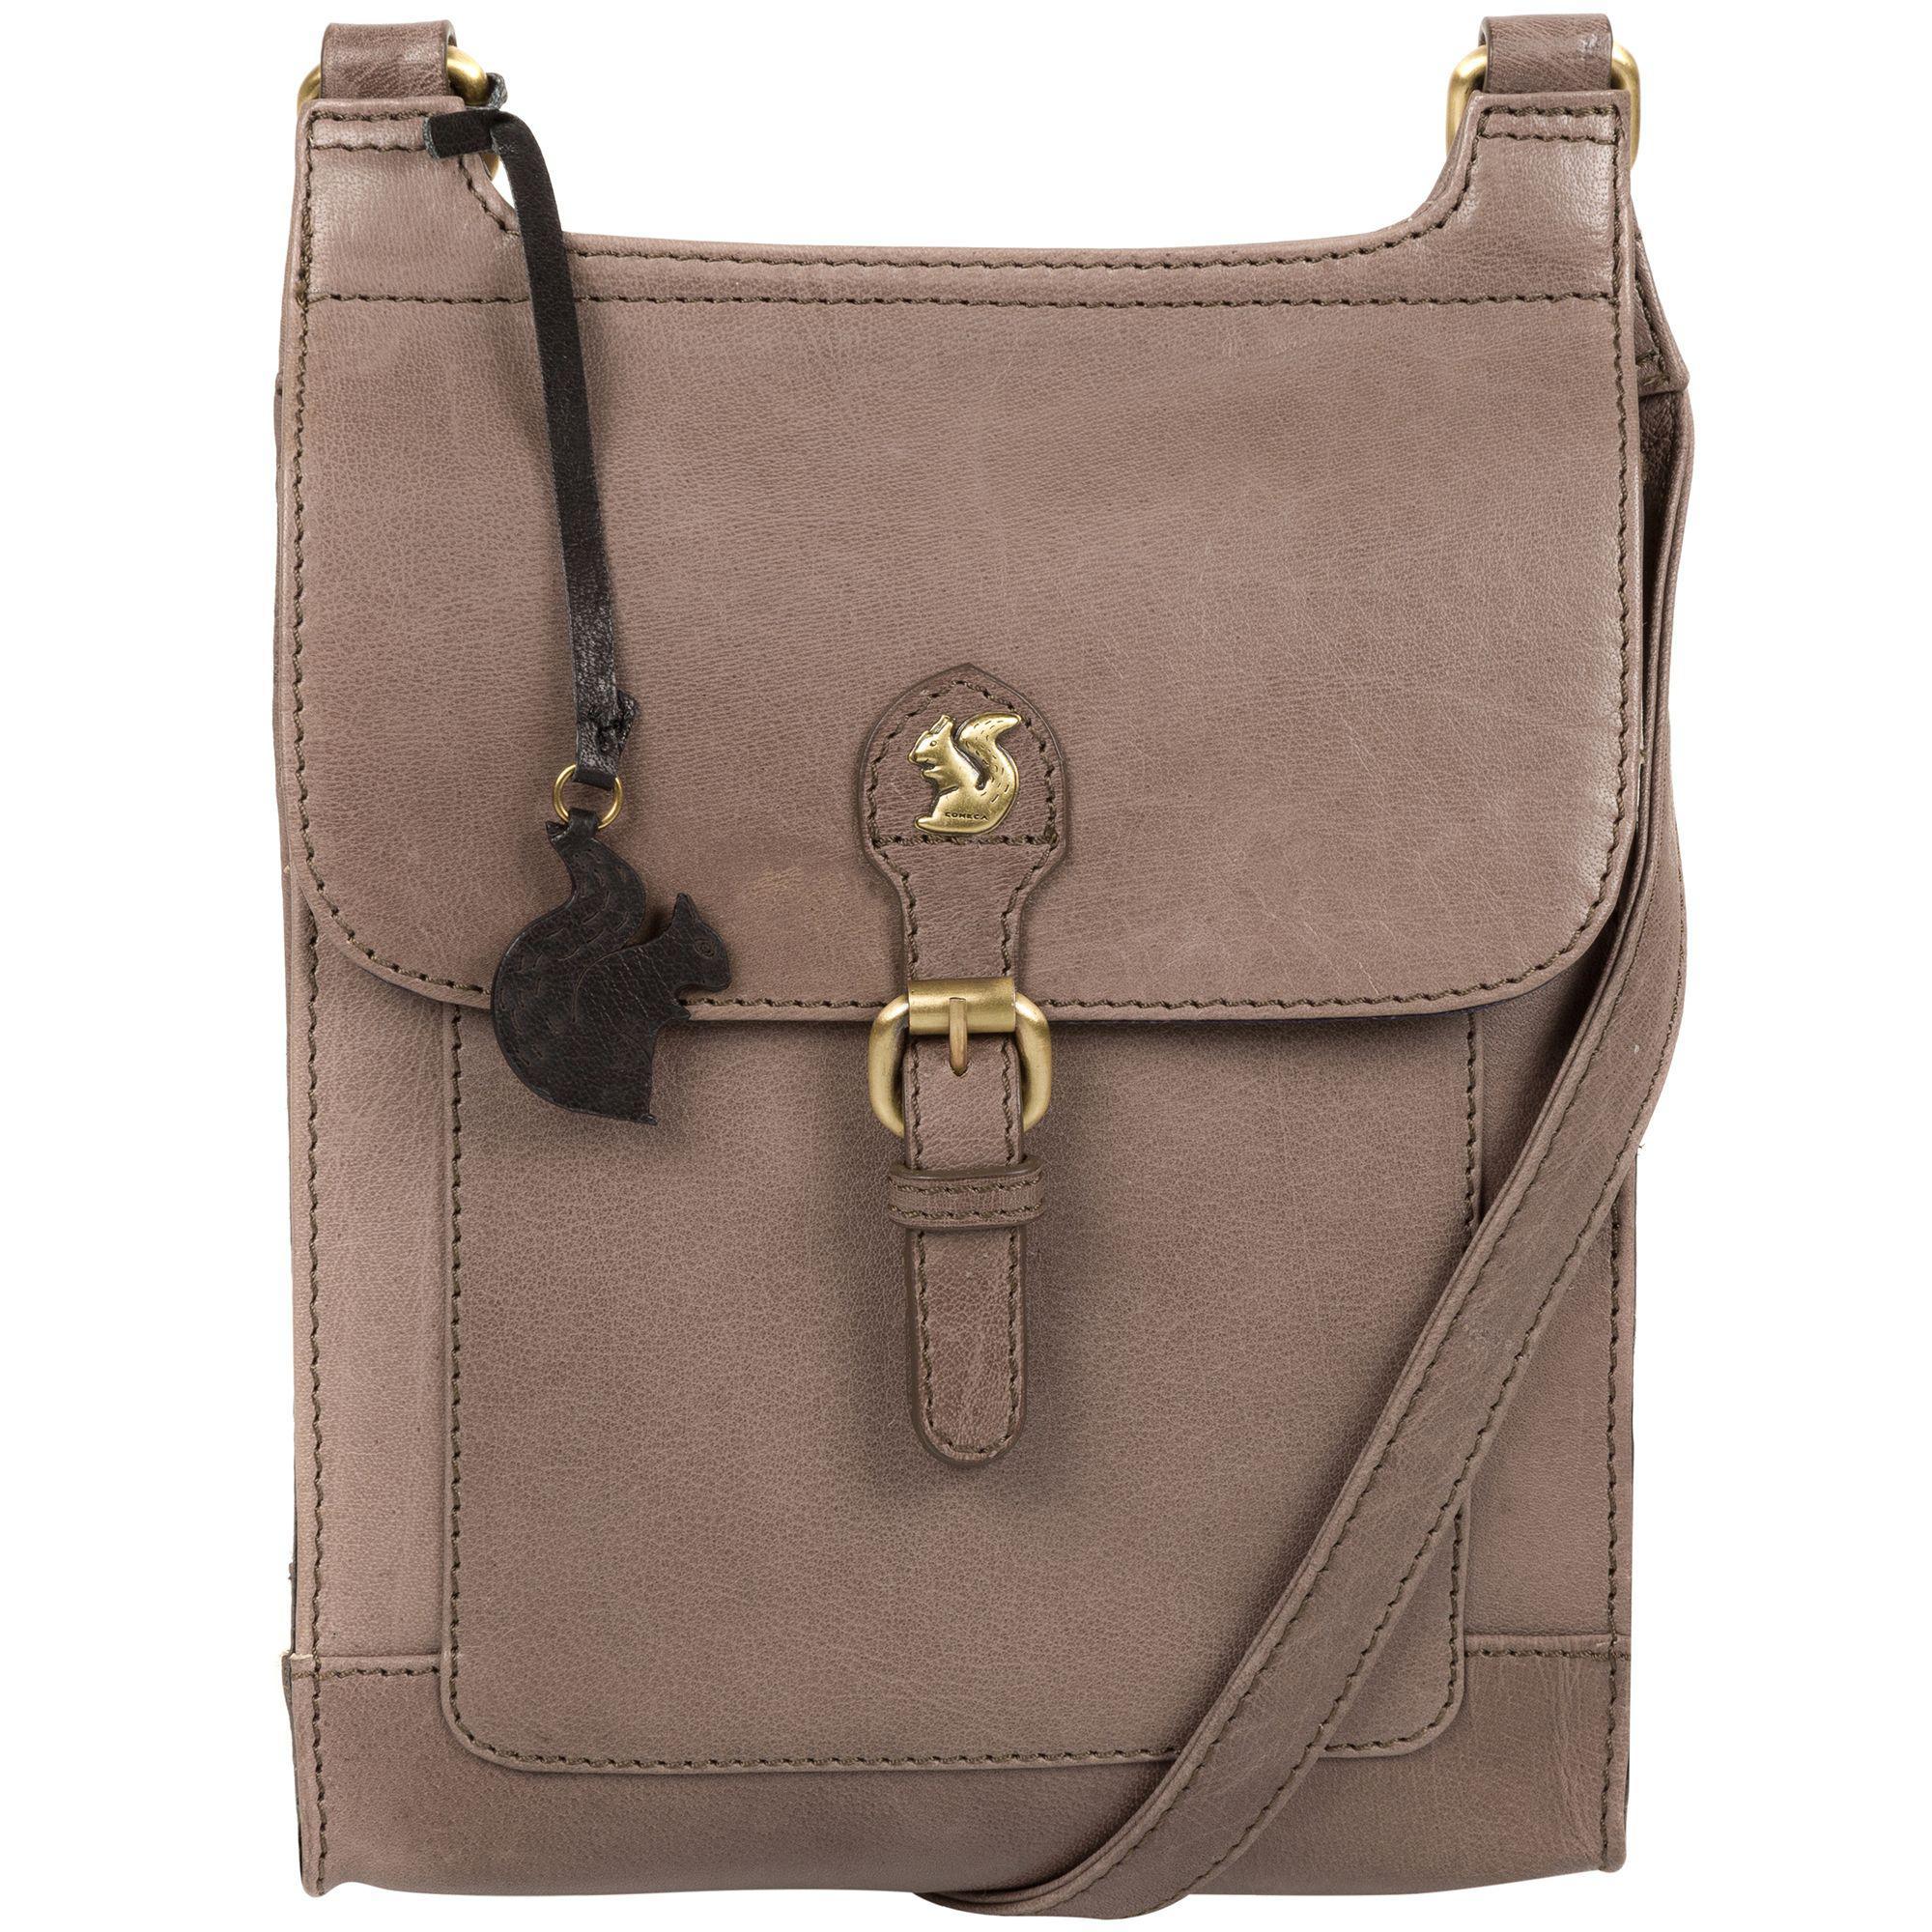 58e68d0e7041 Conkca London Dark Grey  sasha  Handmade Leather Cross-body Bag in ...